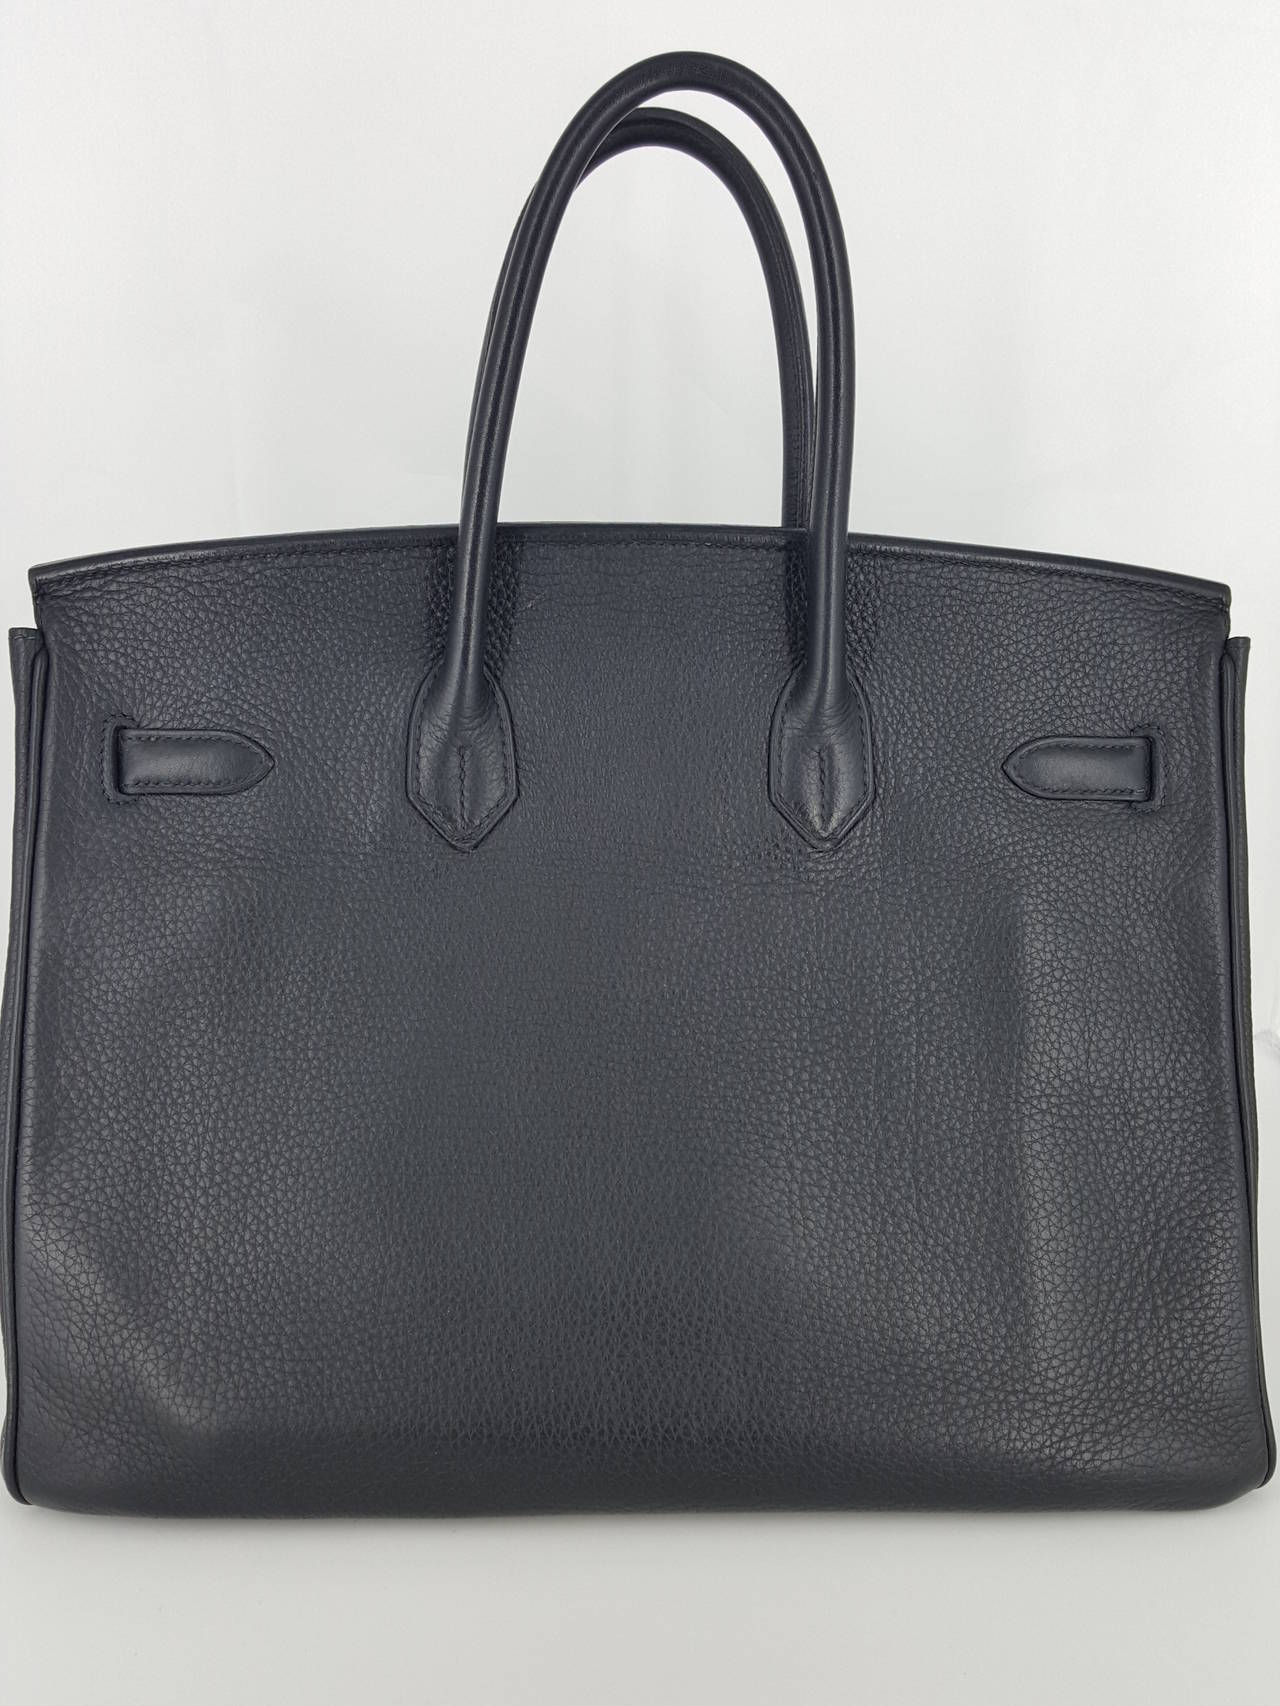 HERMES Birkin 35 CM In Black Clemence Leather With Palladium Hardware. 2